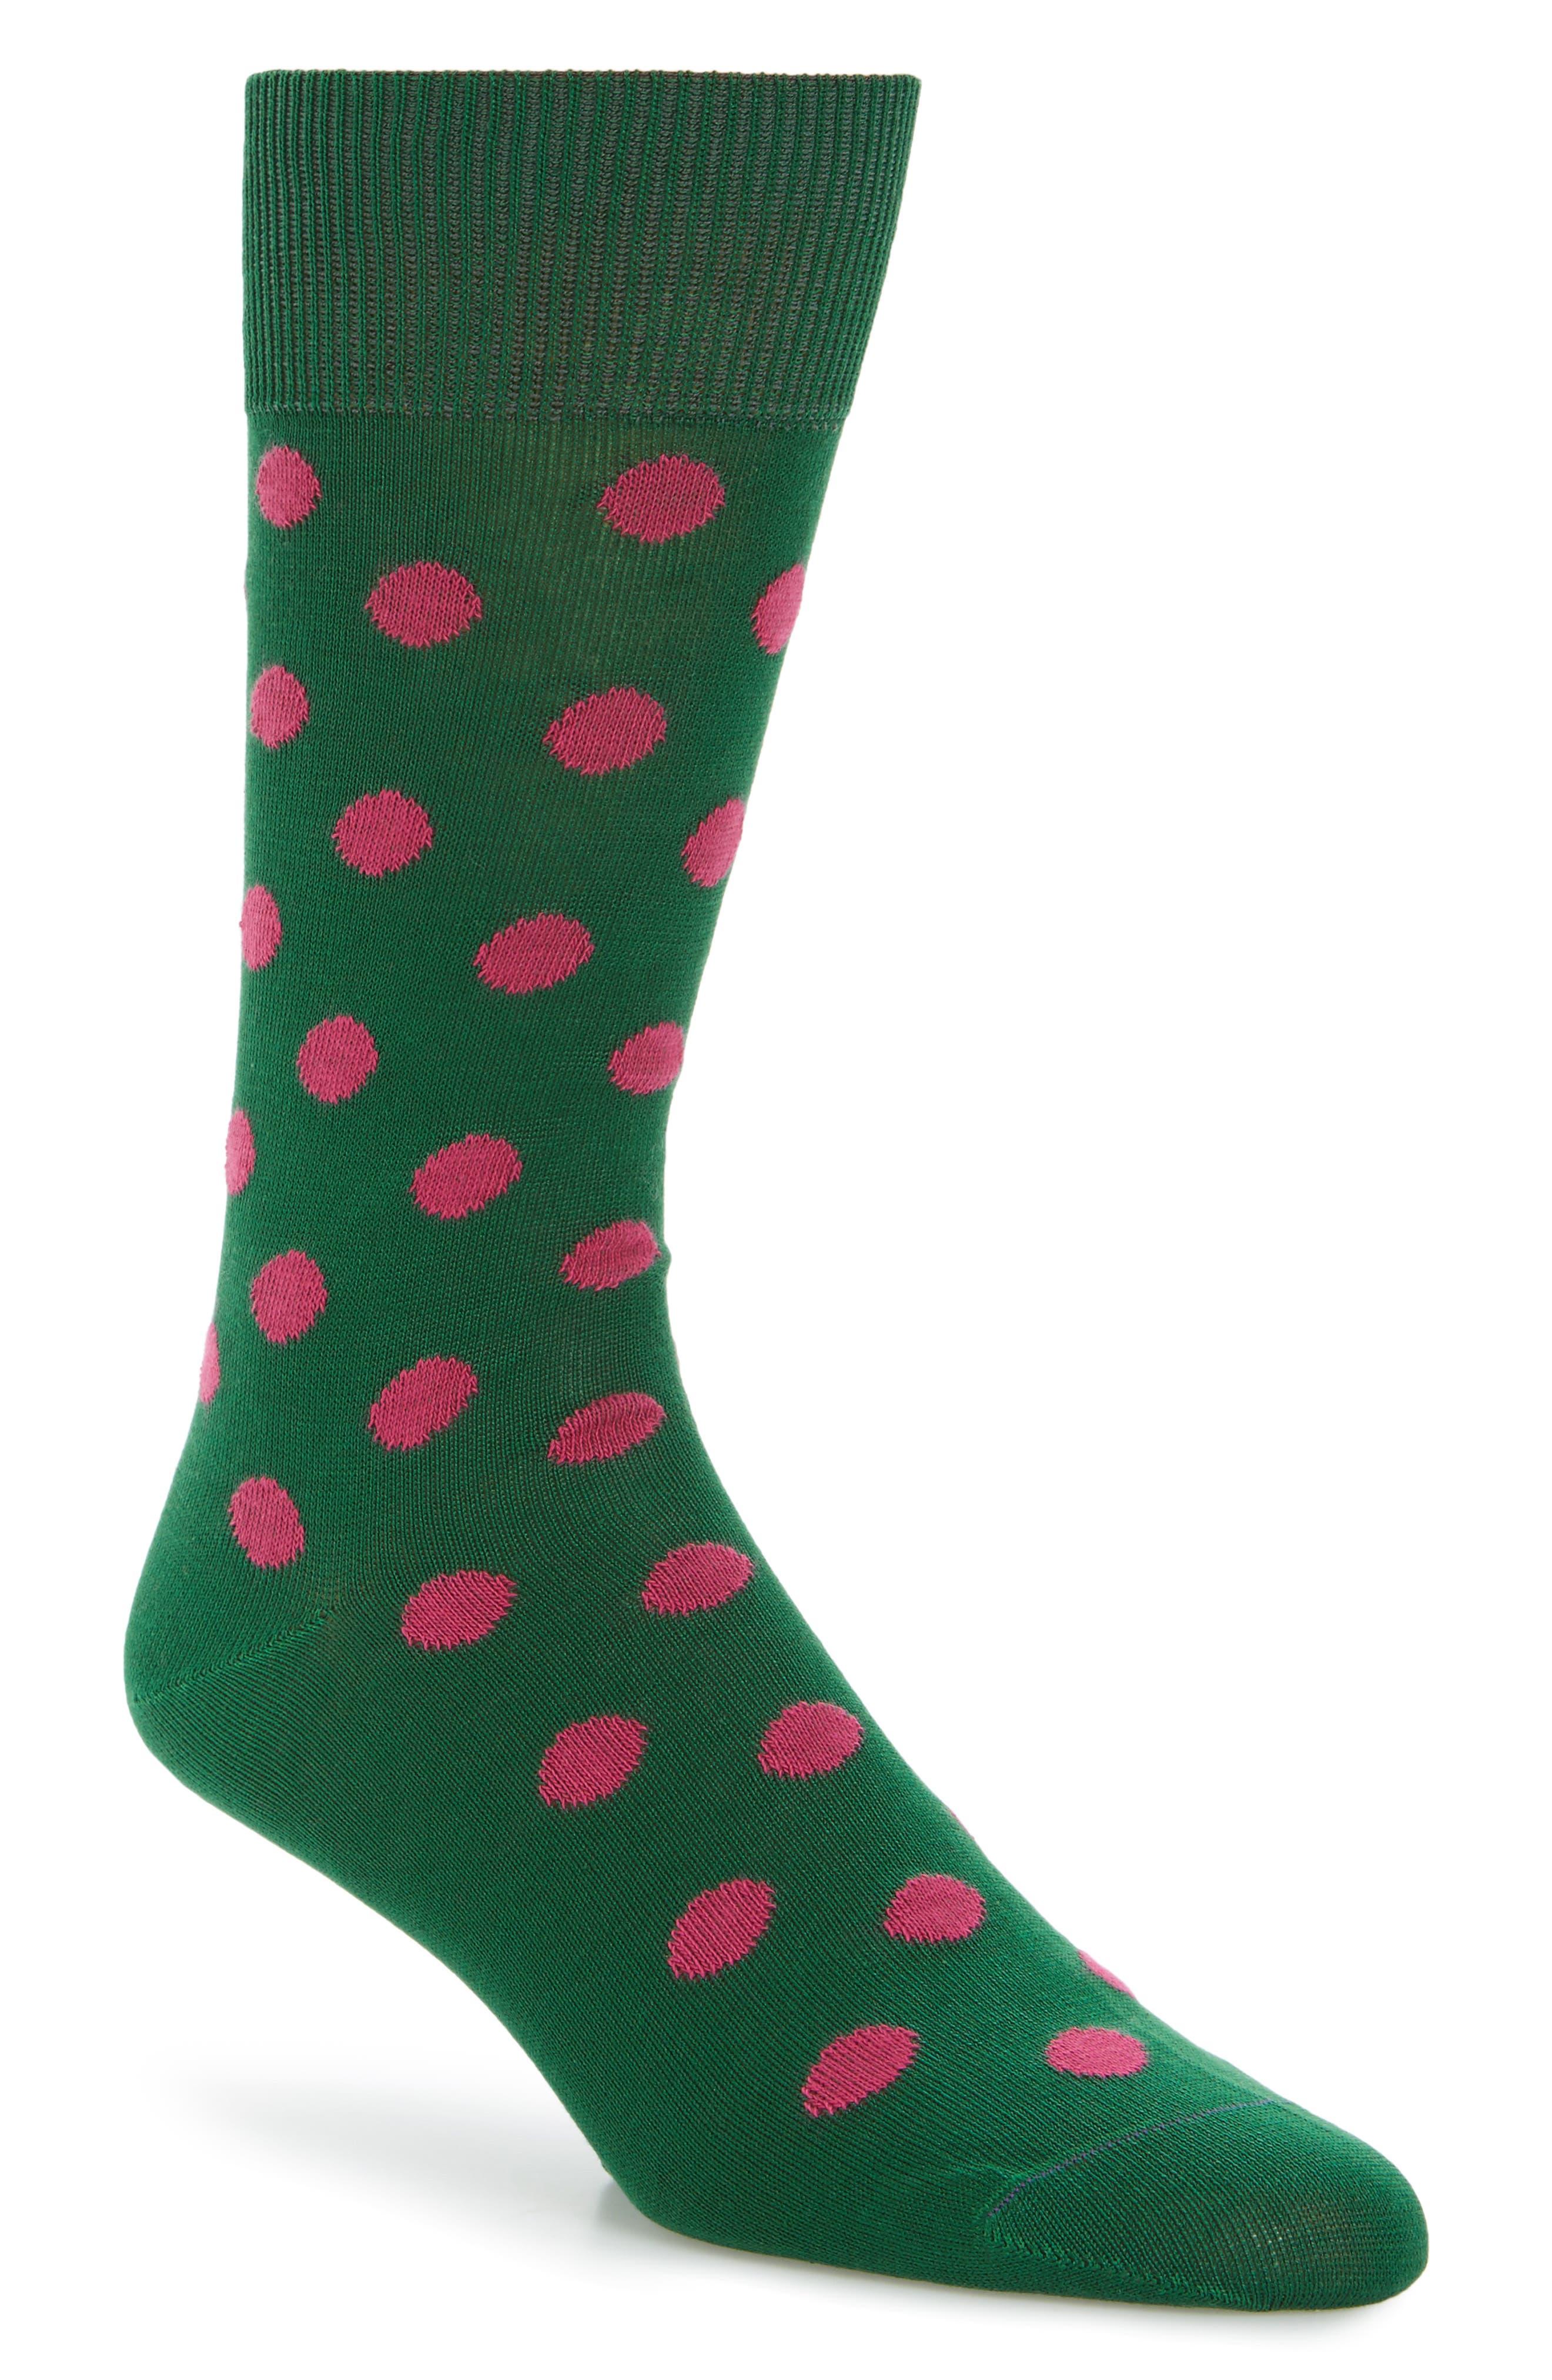 Alternate Image 1 Selected - Paul Smith Bright Polka Dot Socks